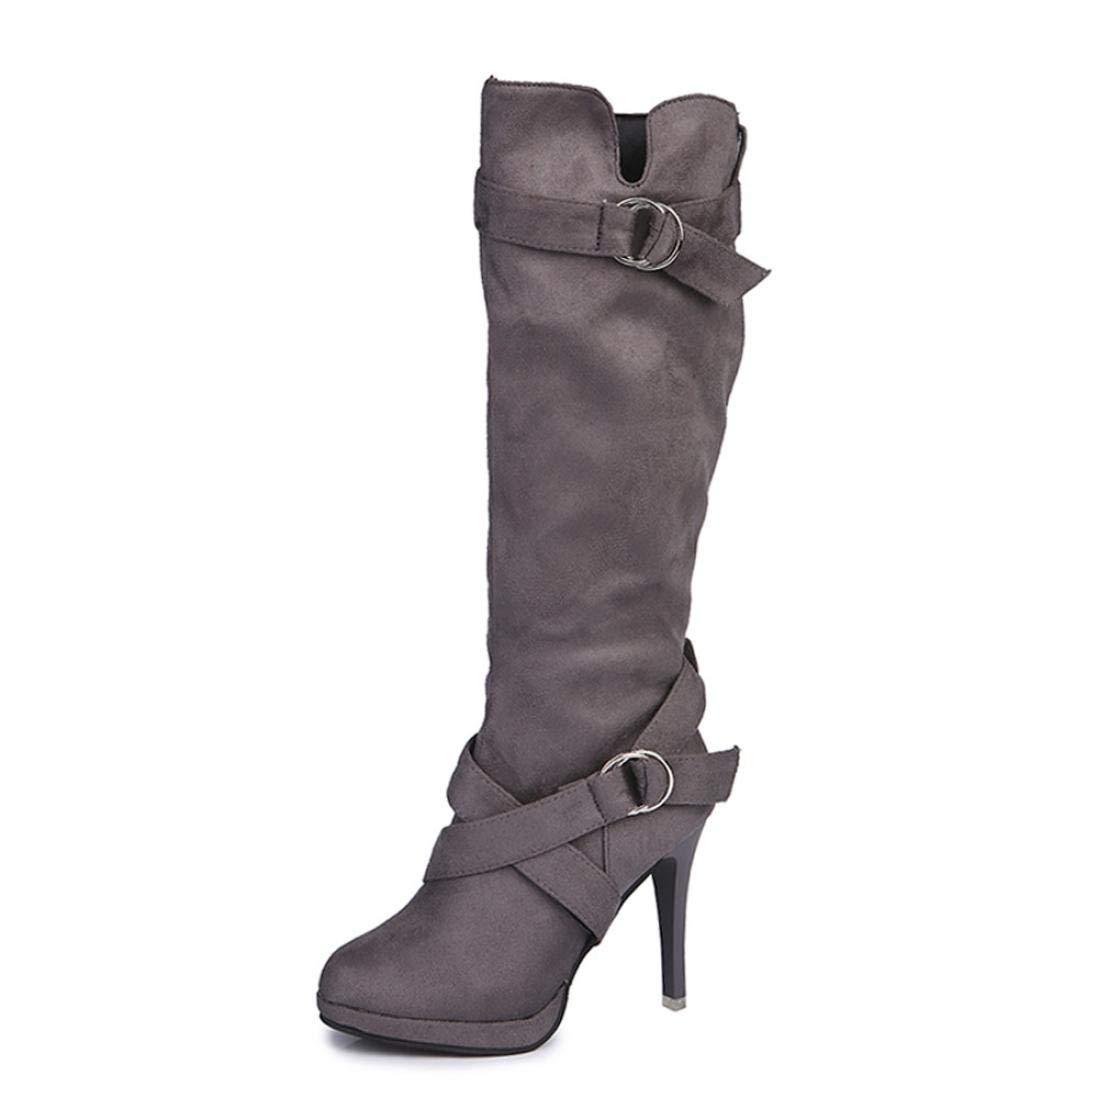 Tootu Women Buckle Roman Platform High Heels Knee Boots Martin Long Boots